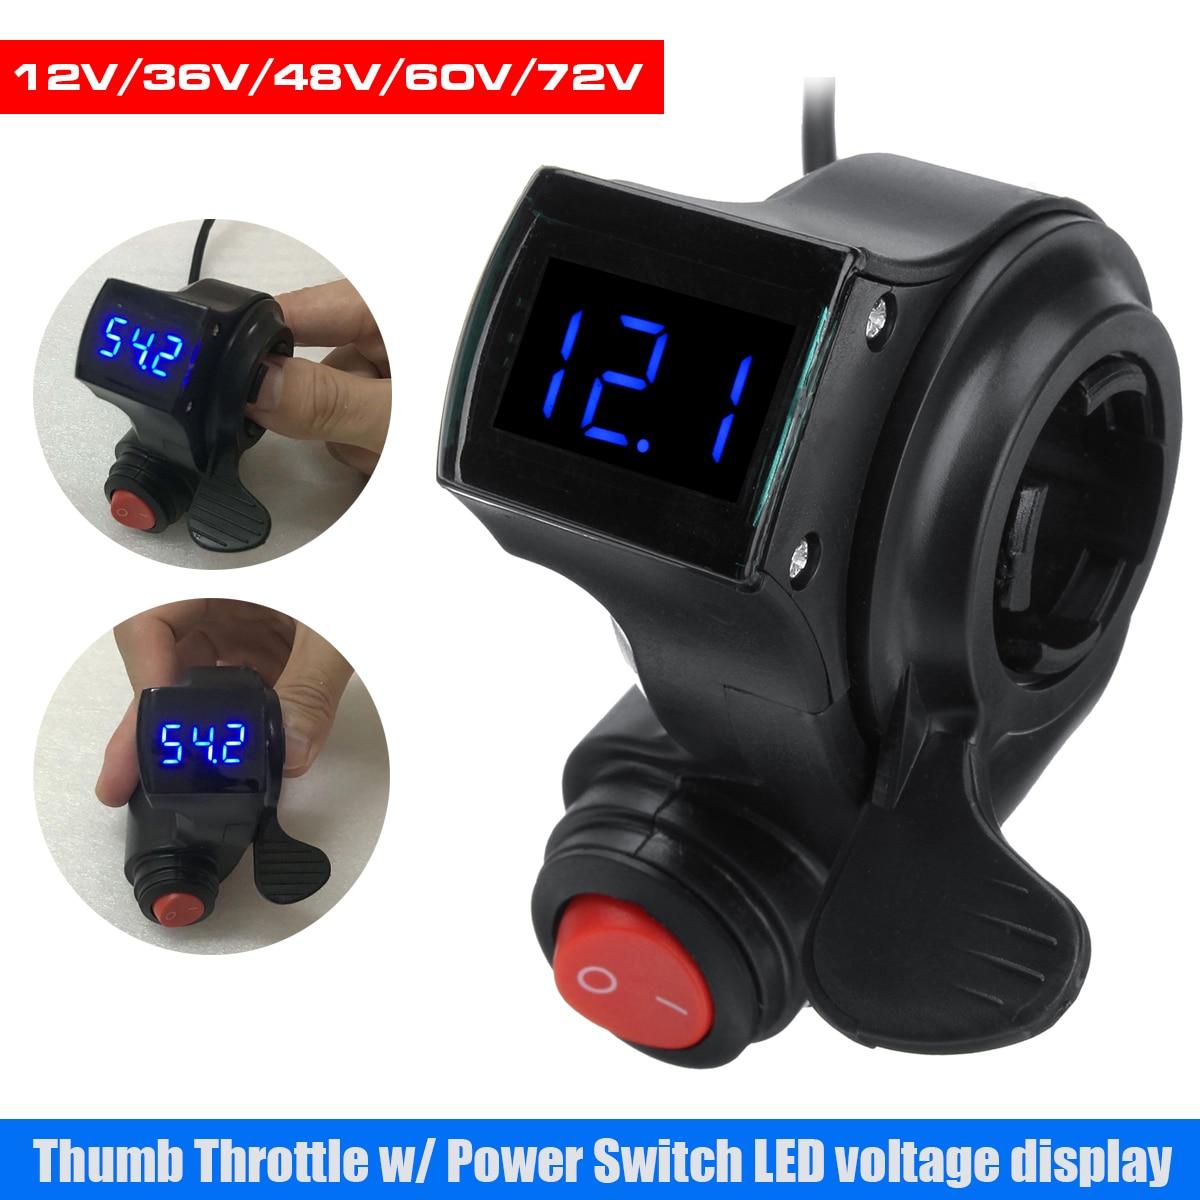 Dedo pulgar acelerador Scooter eléctrico con interruptor de alimentación LED interruptor de pantalla manillar empuñaduras para bicicleta eléctrica 36 V/48/60/72 v